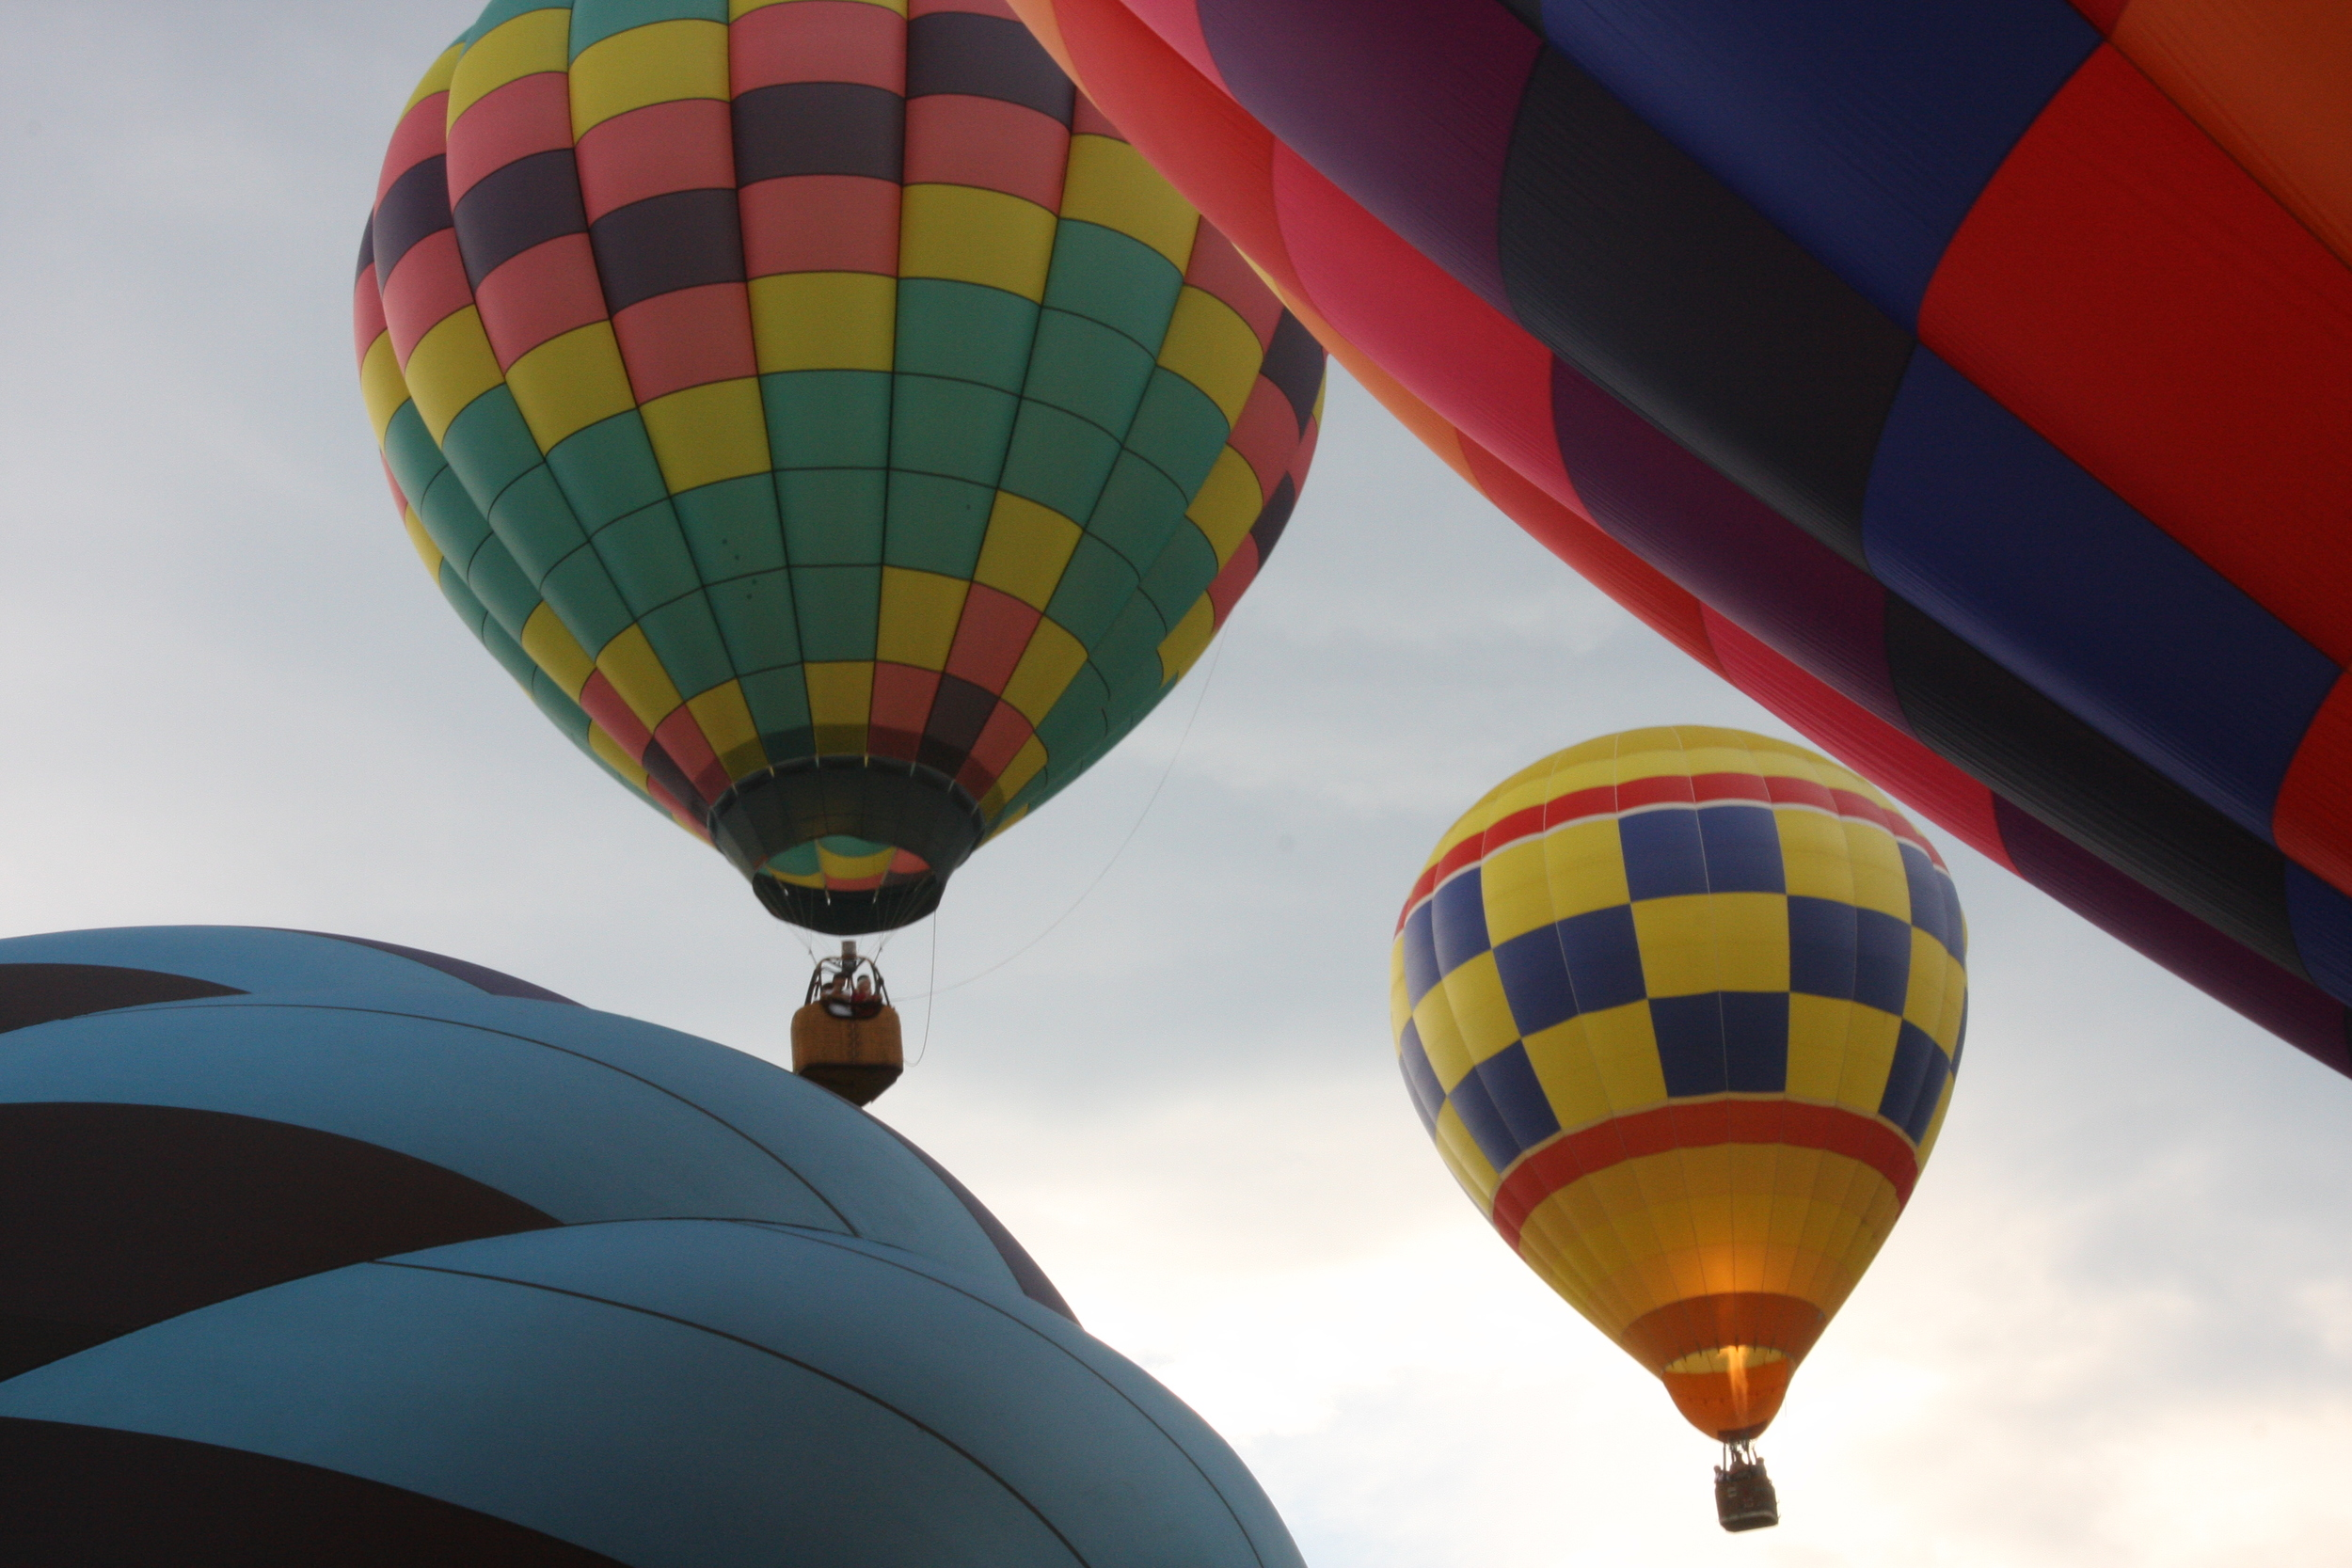 balloon-rally.jpg